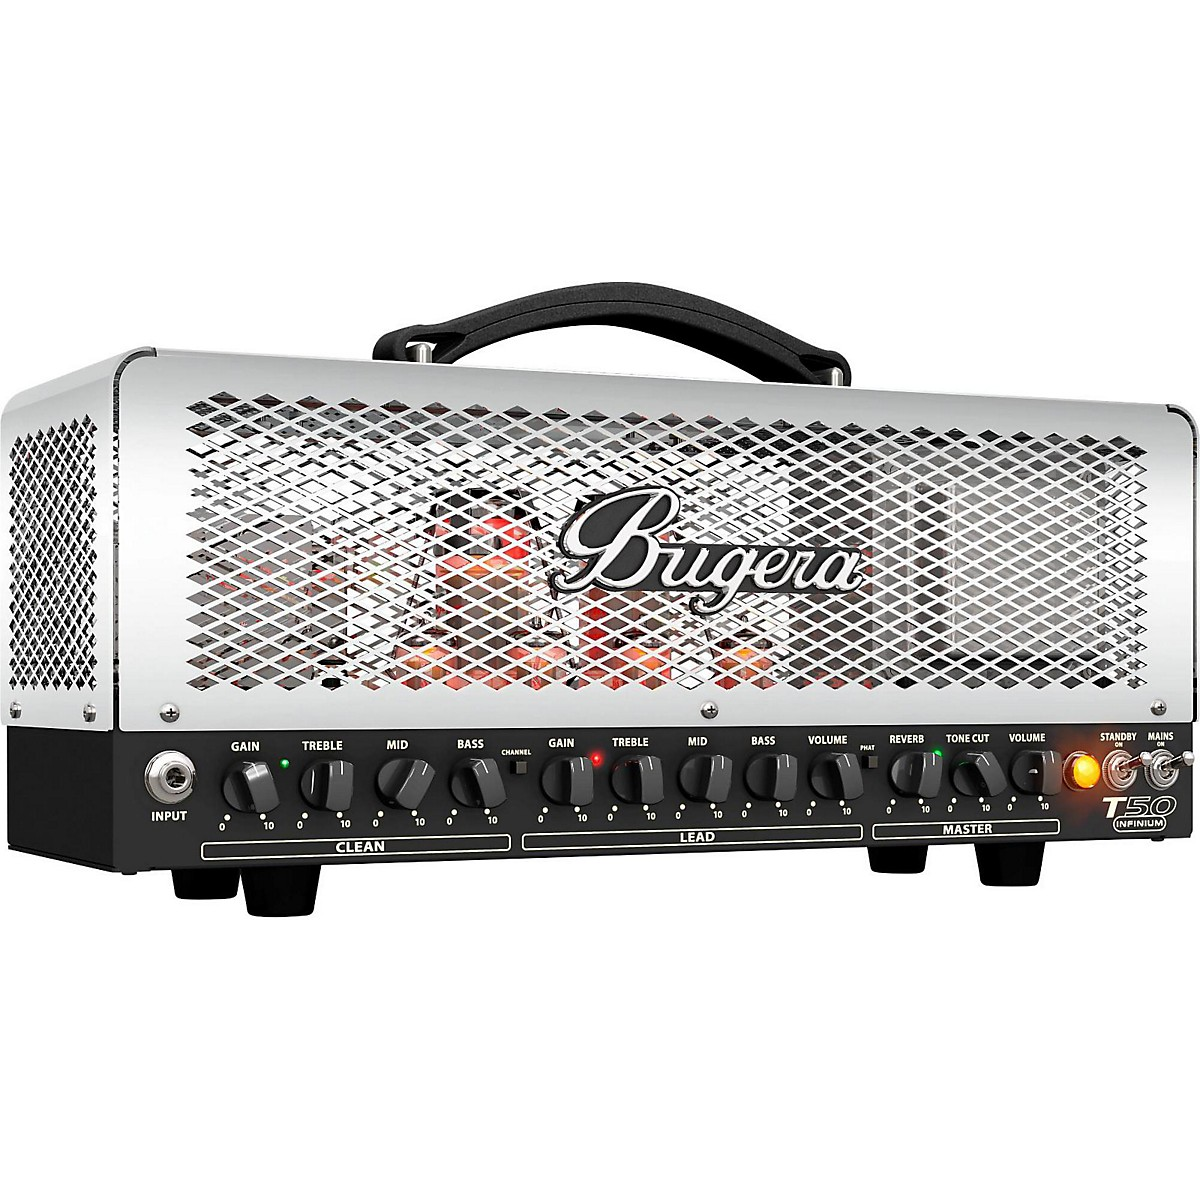 Bugera T50 Infinium 50W Tube Guitar Amplifier Head